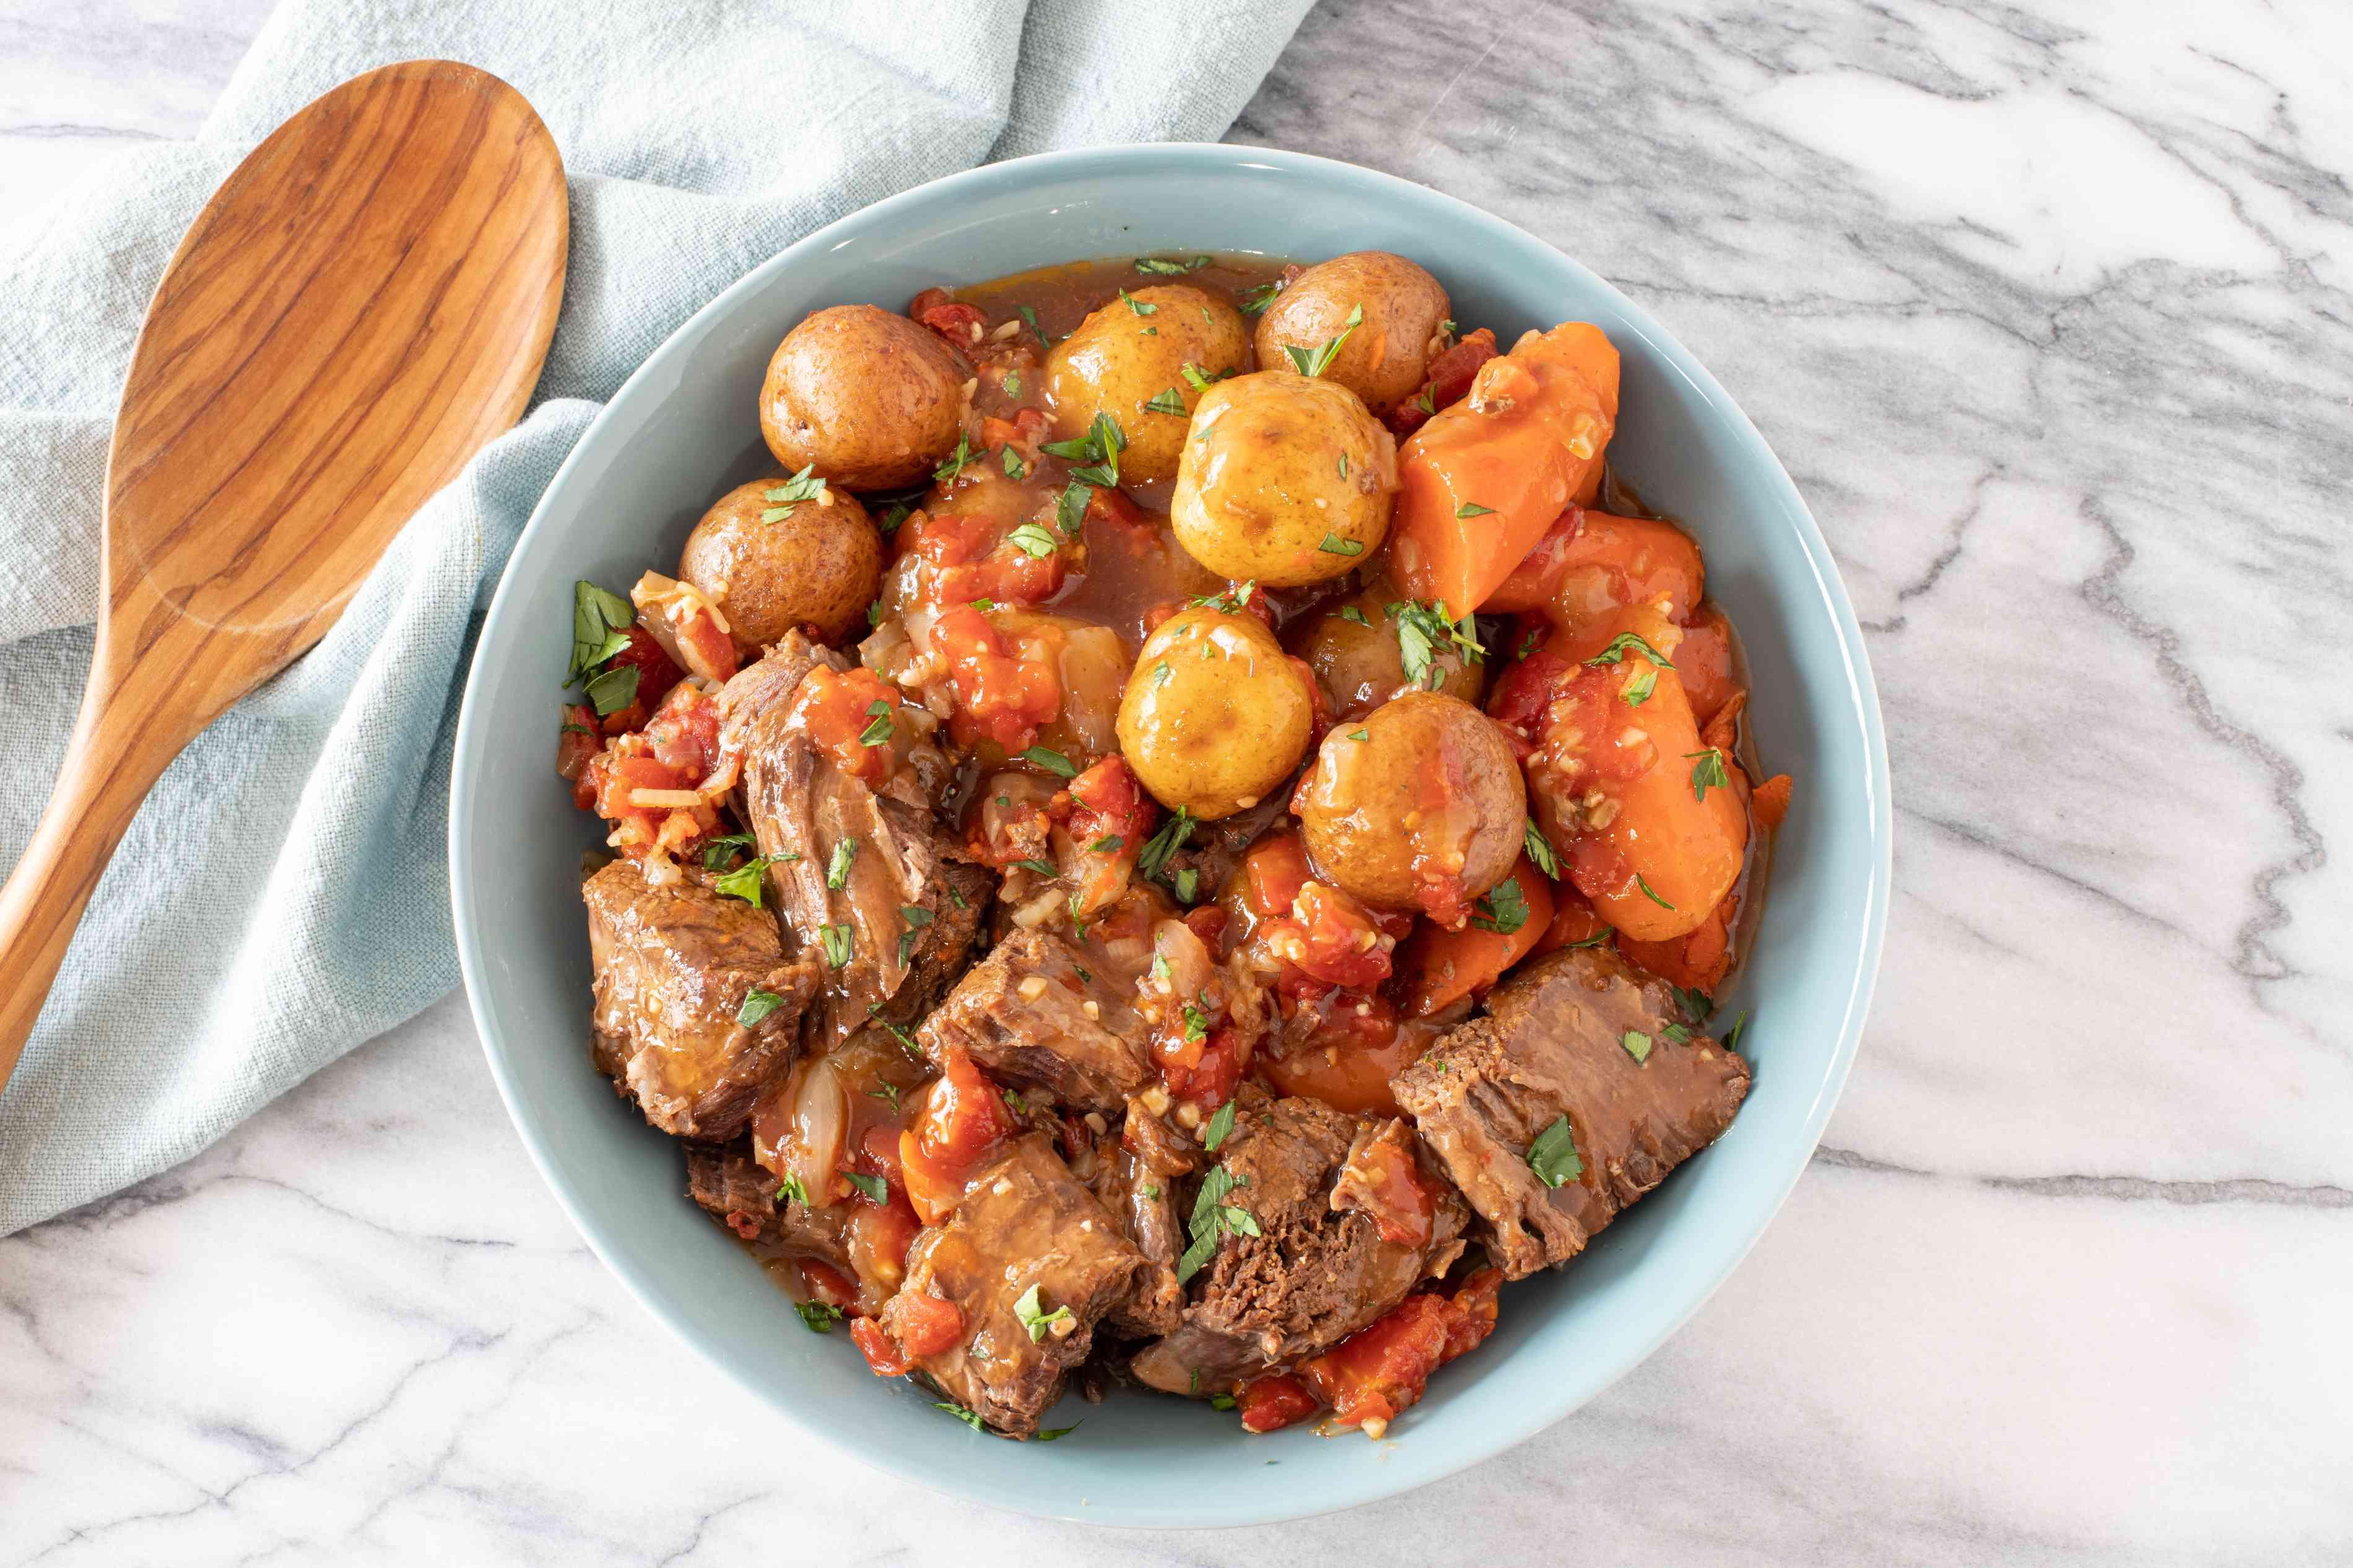 Slow cooker pot roast with potatoes, Italian-style.